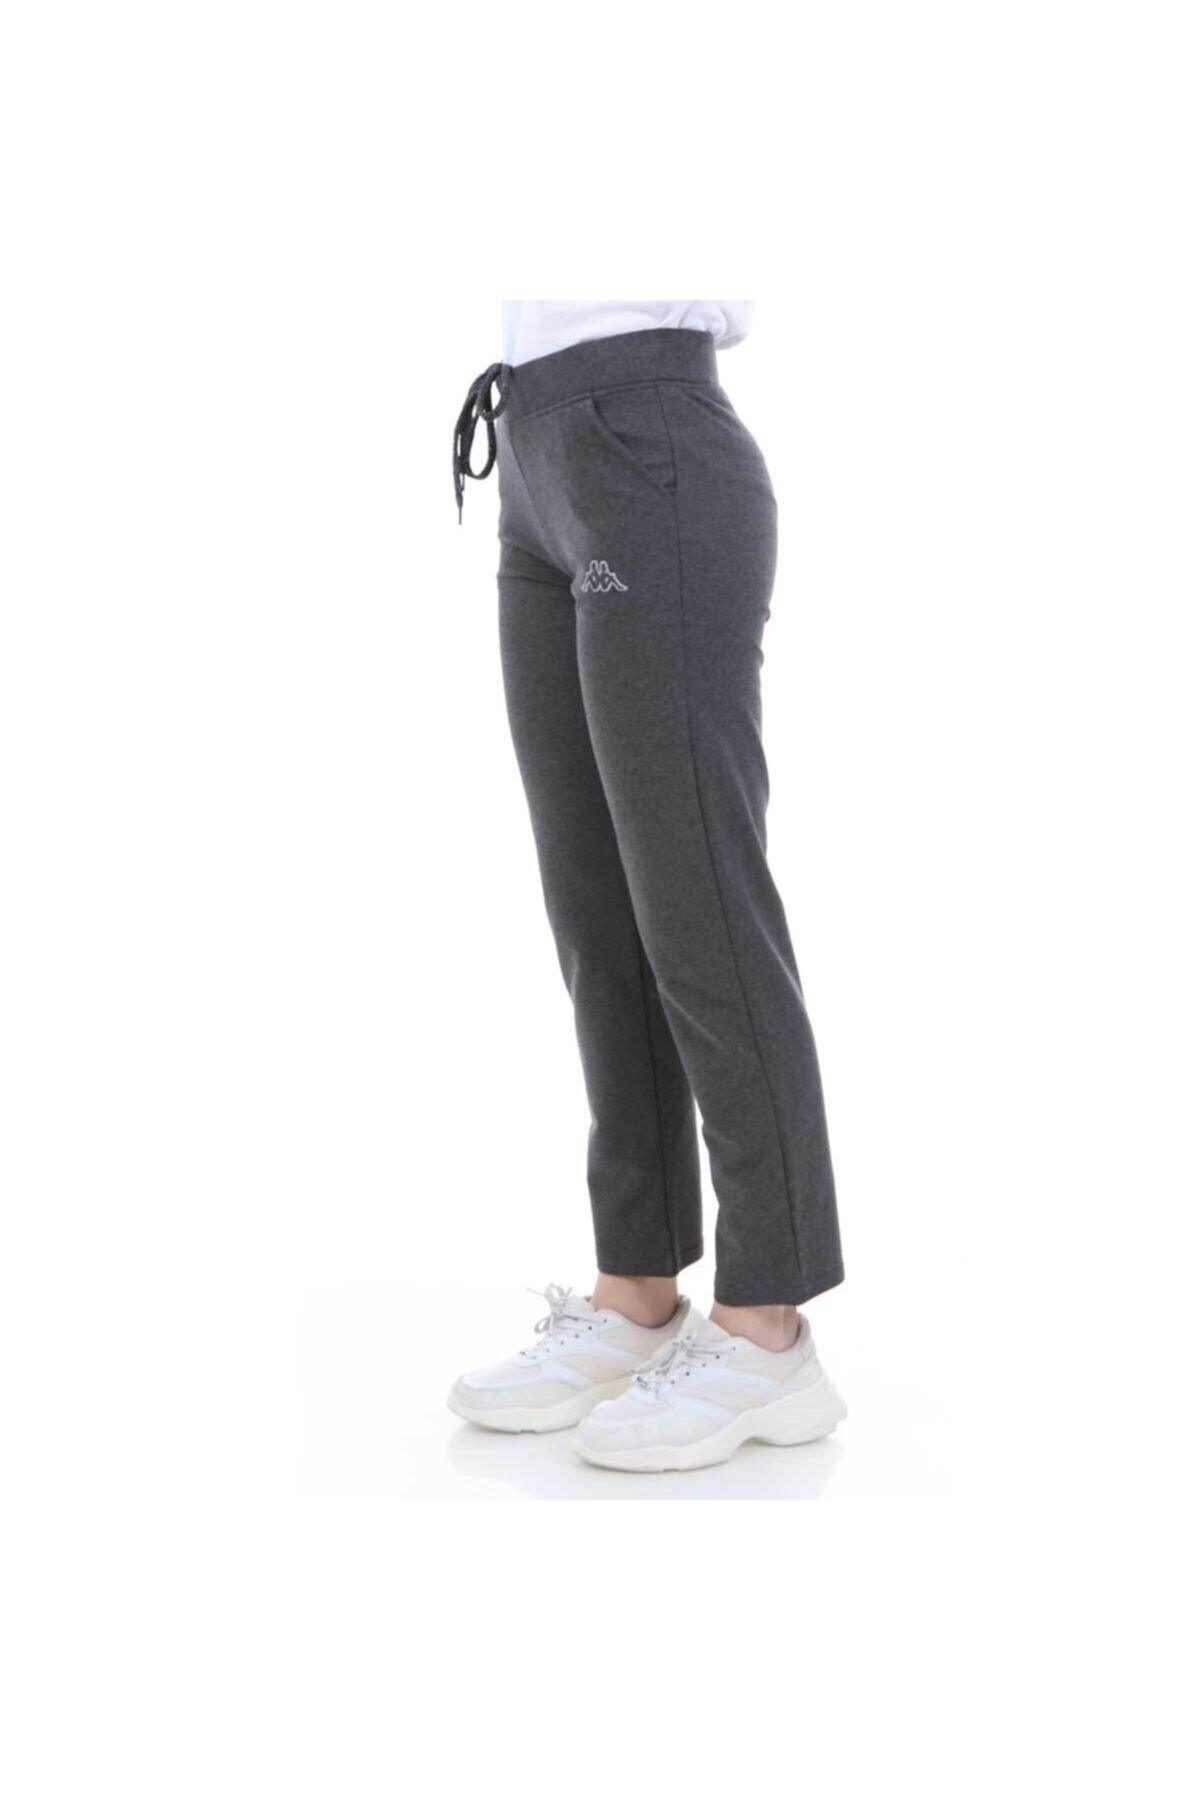 Kappa 30327k0 Kadın Sweat Pantolon Zeny - Füme - Xl 2